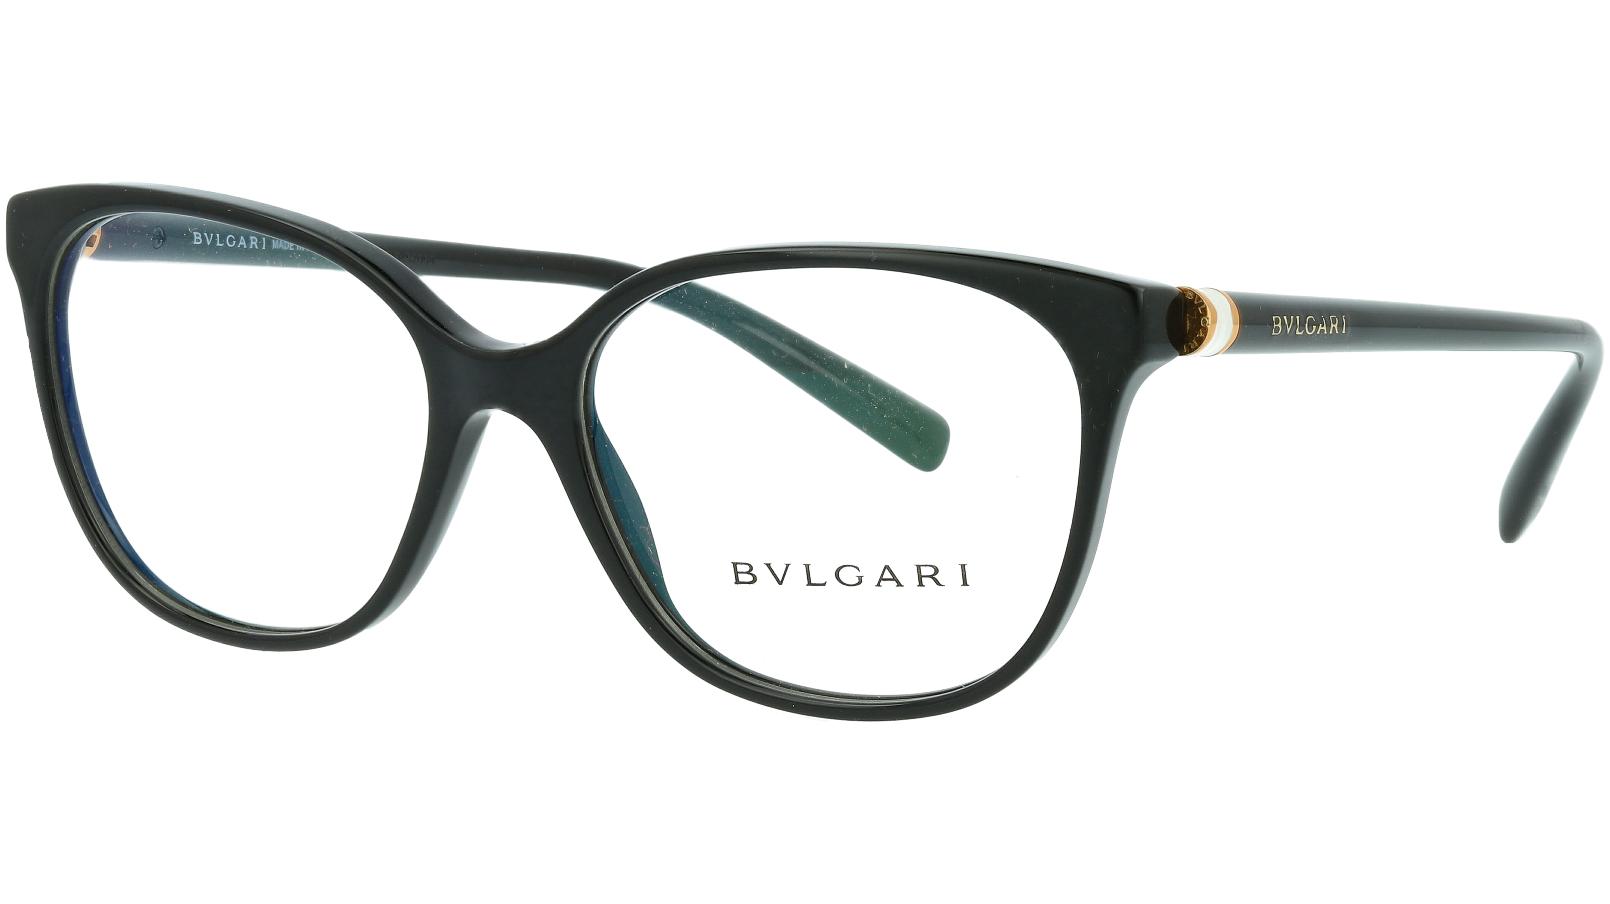 Bvlgari BV4129 501 54  Black Glasses